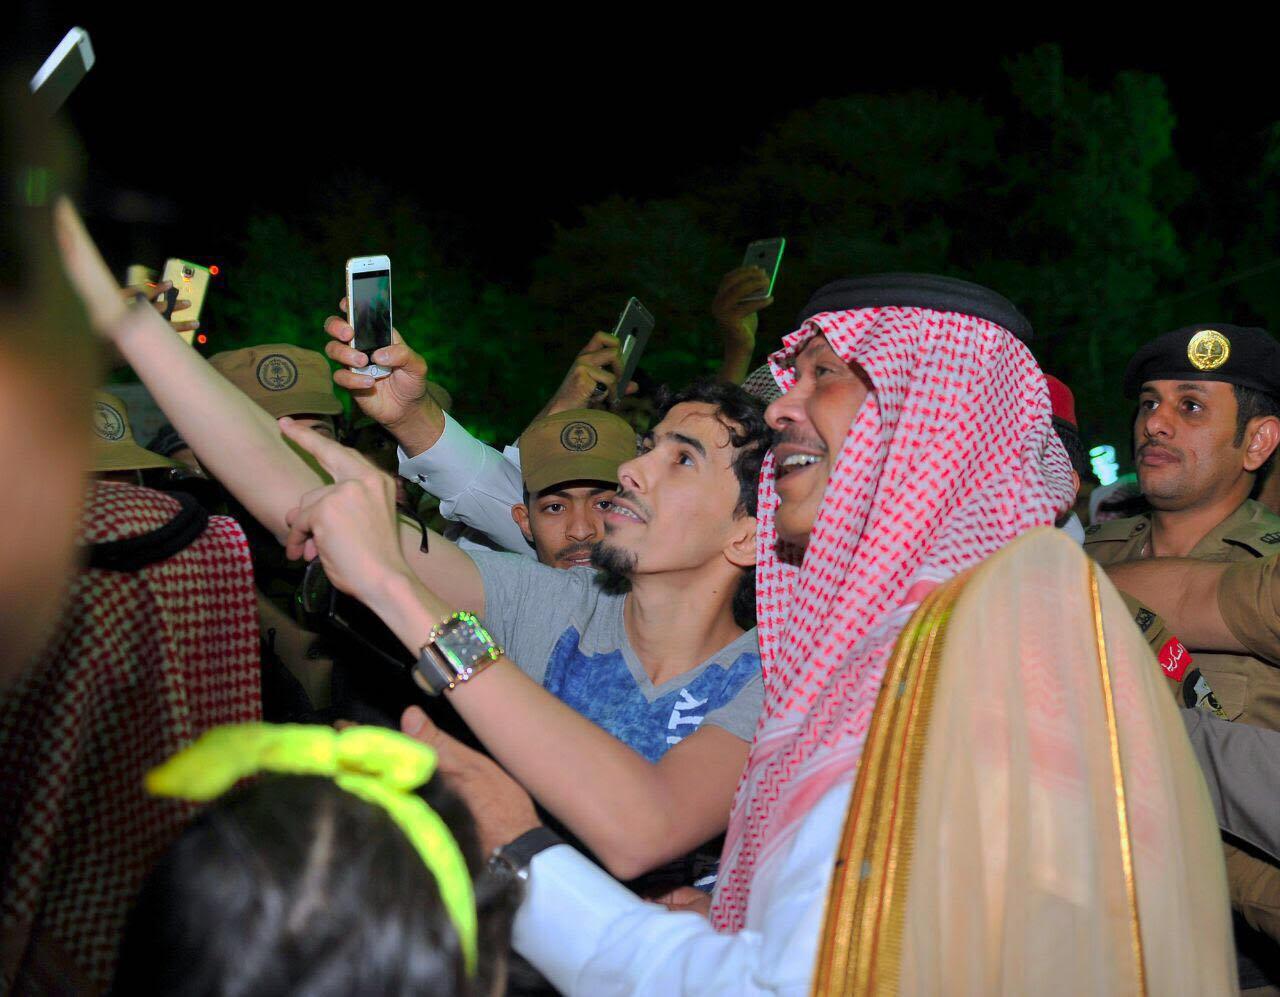 مشاري بن سعود يدشن مهرجان صيف الباحة